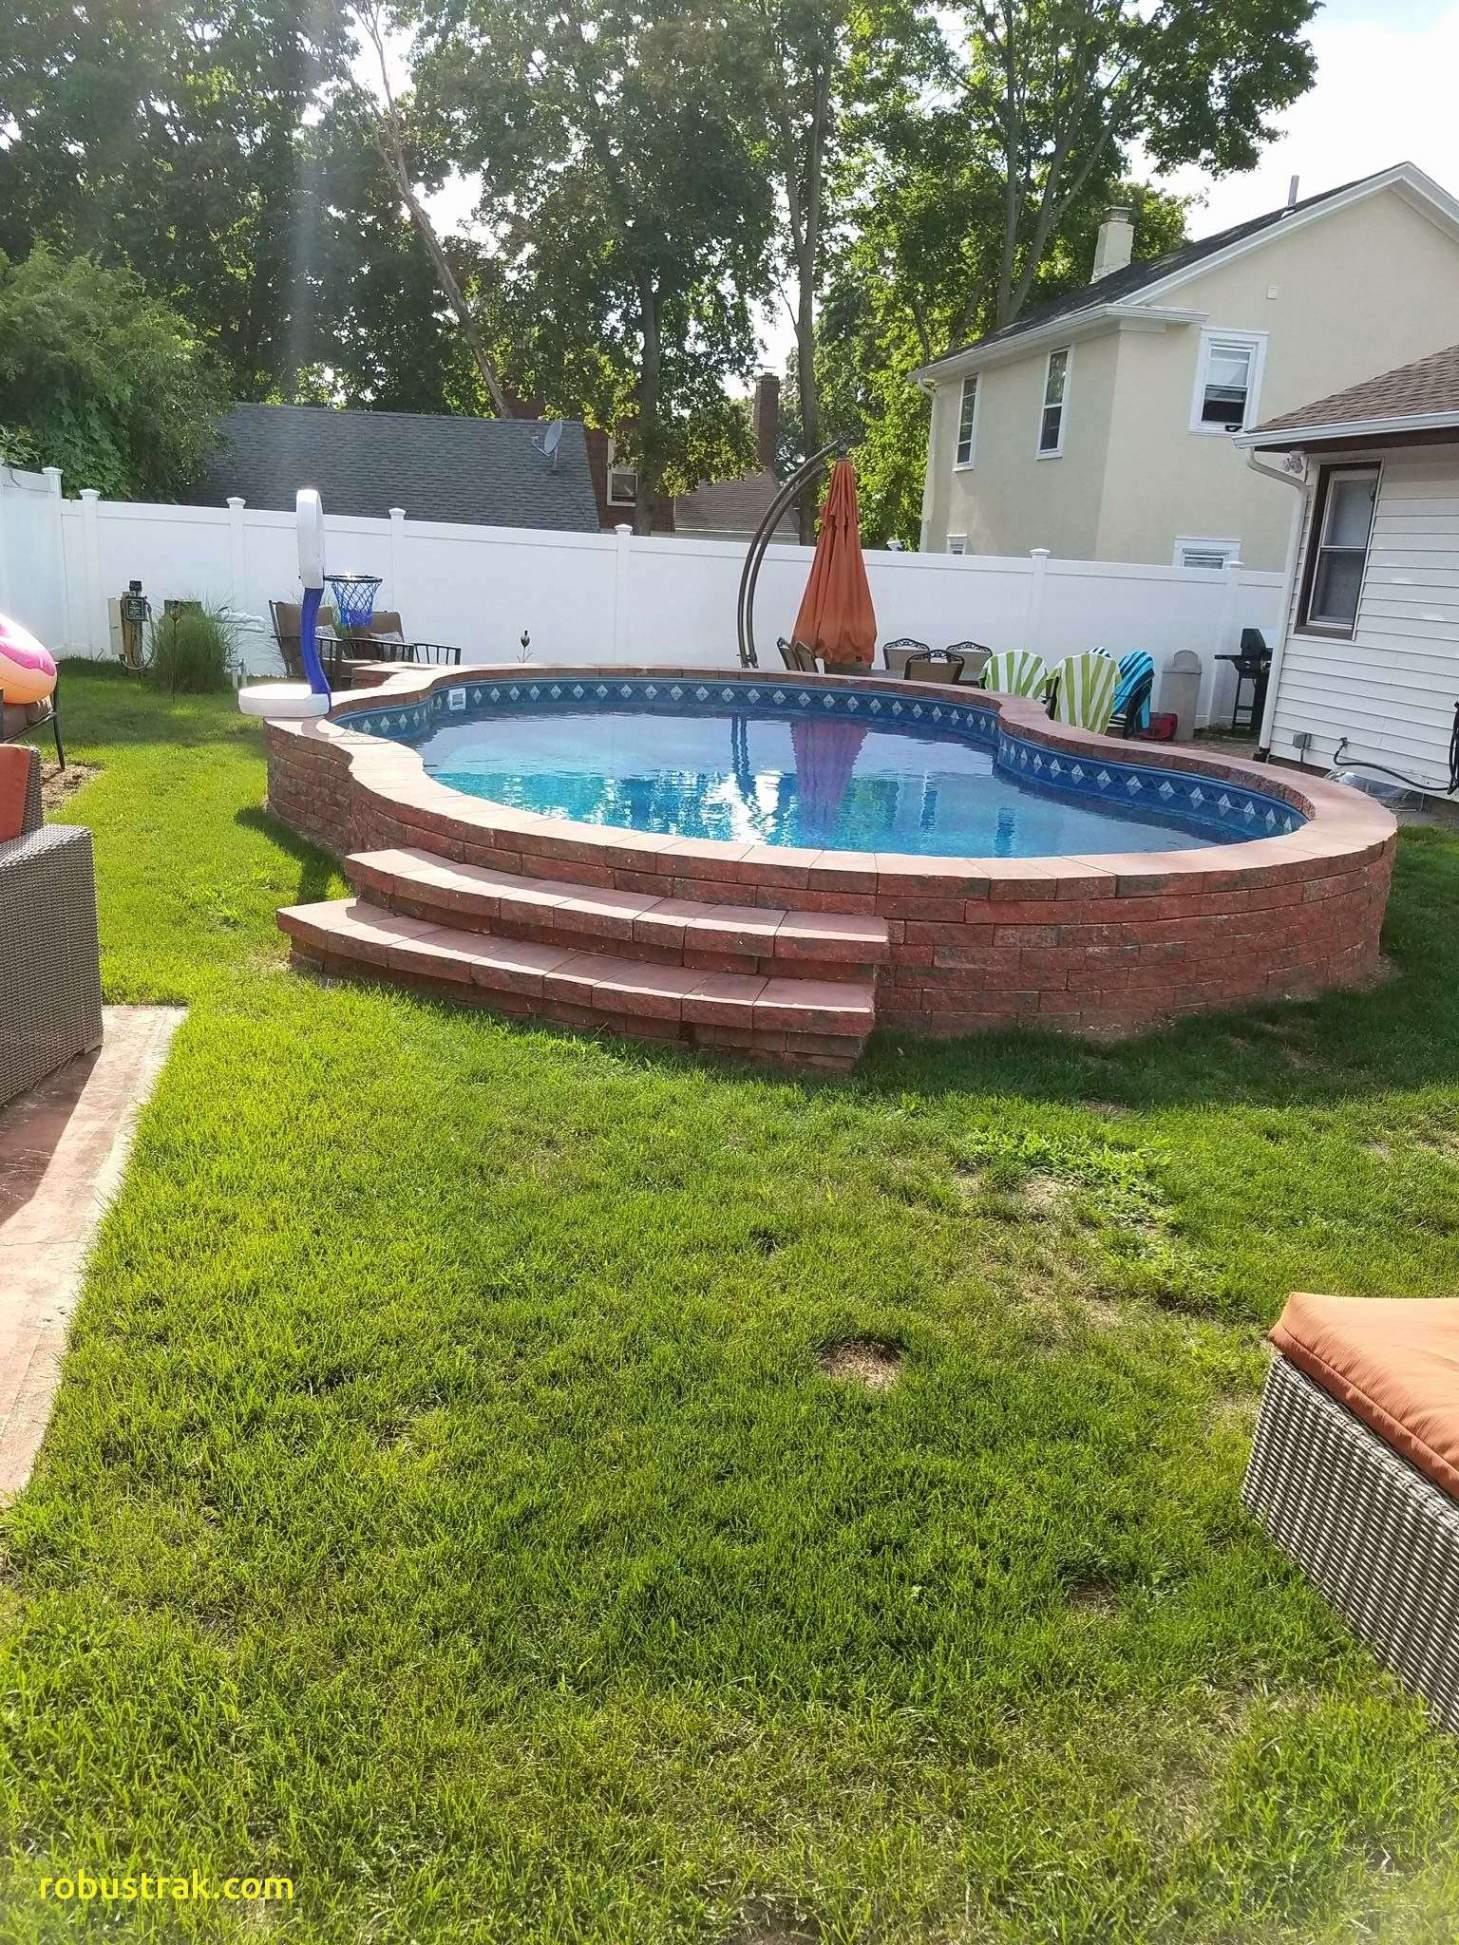 Garten Pool Ideen Schön Pool Kleiner Garten — Temobardz Home Blog